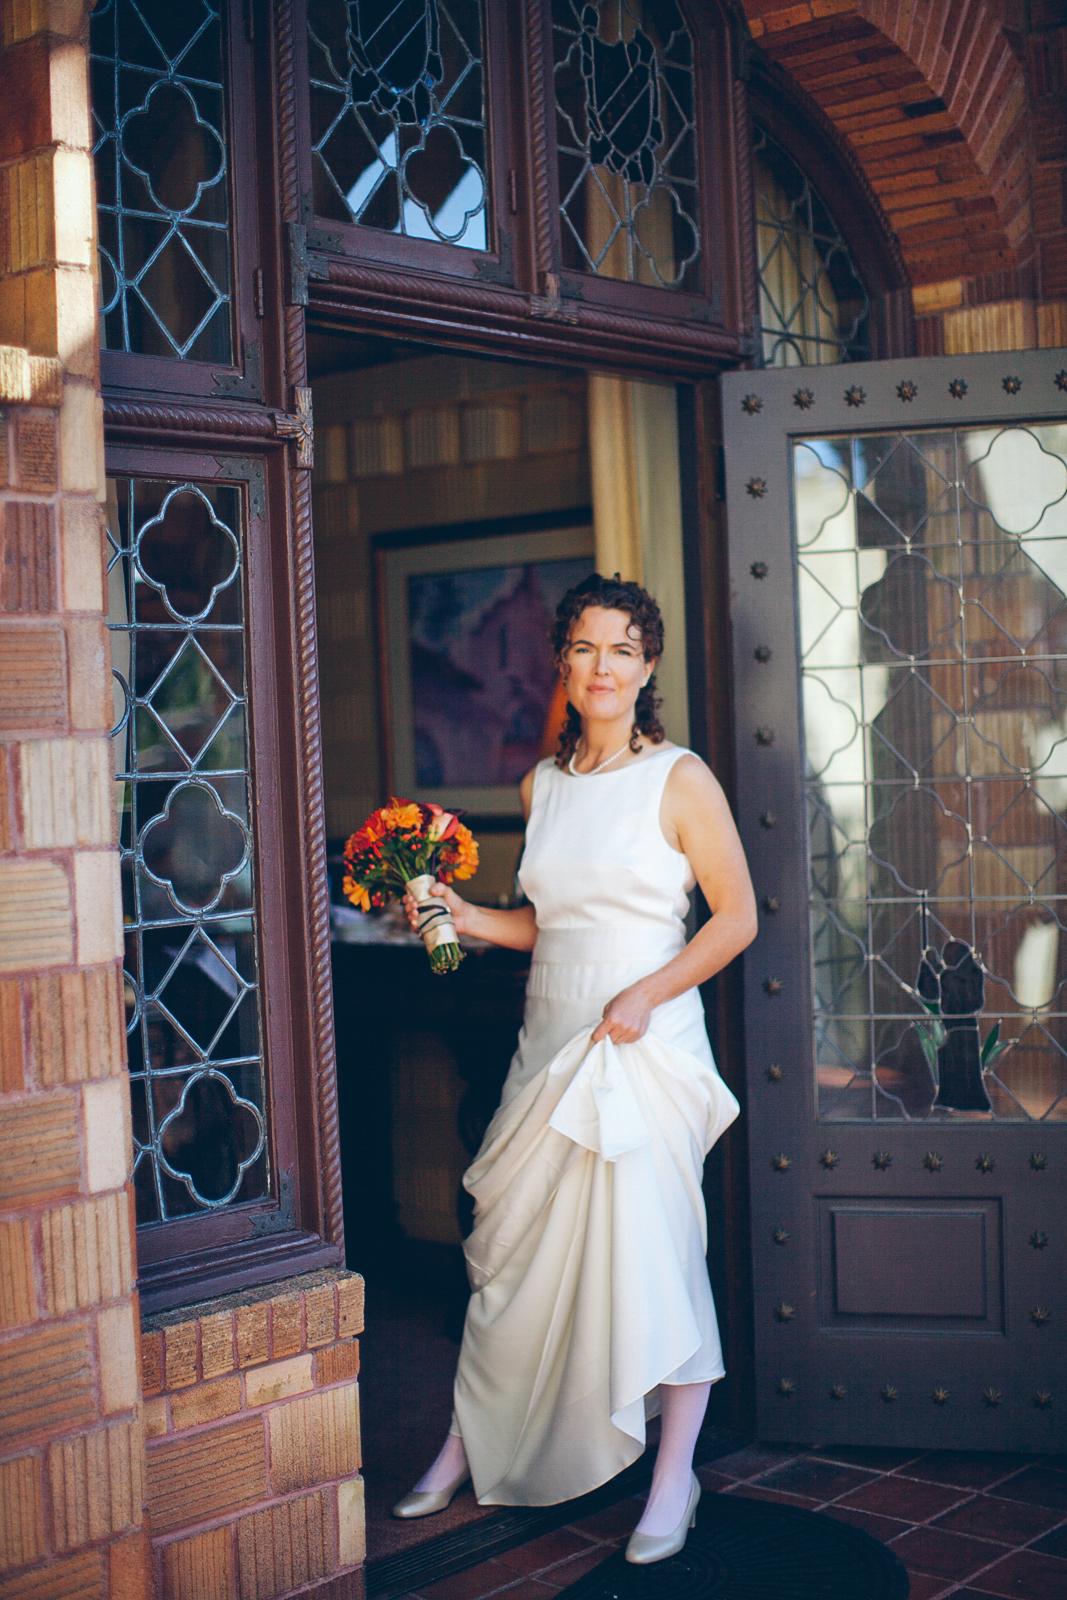 Riverside_ca_wedding_photography_marguerite_carolyn_ebony_siovhan_bokeh_photography_15.jpg